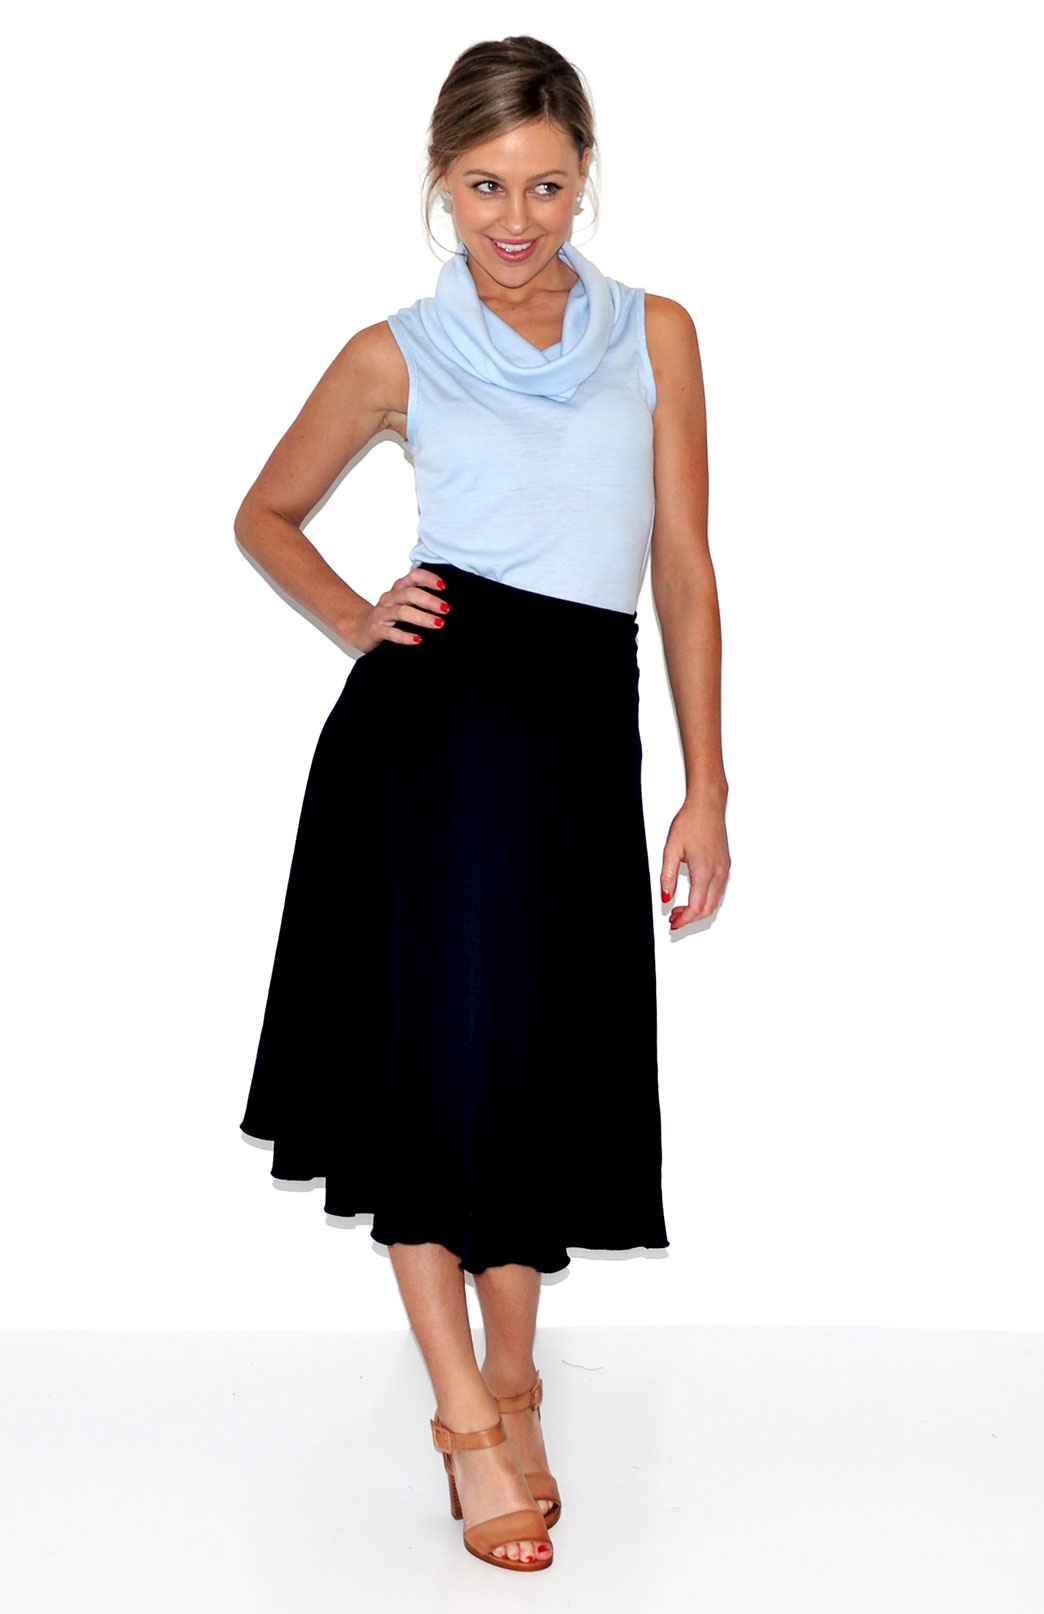 Cowl Neck Top - Sleeveless - Women's Icy Blue Sleeveless Trans-Seasonal Wool Top - Smitten Merino Tasmania Australia